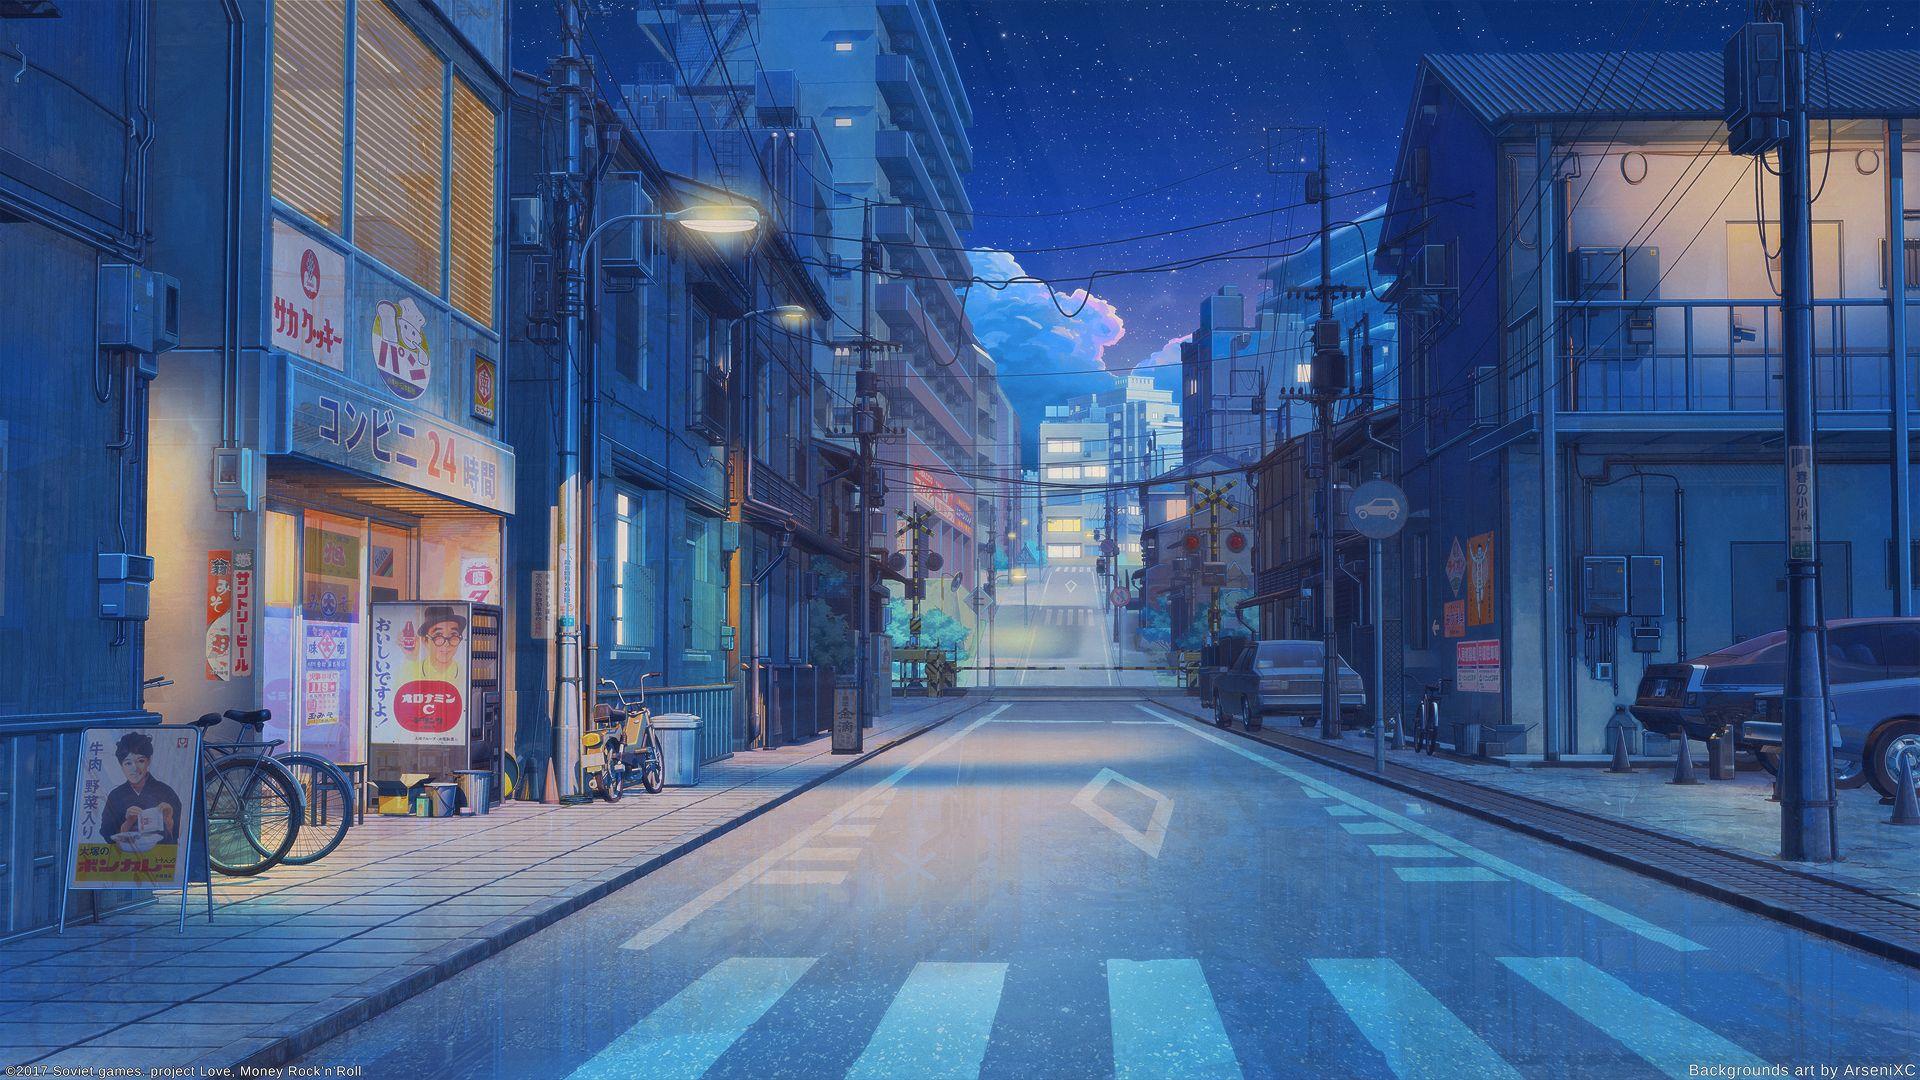 Anime Japanese Street 1920x1080 In 2020 Anime Scenery Wallpaper Anime Scenery Scenery Wallpaper